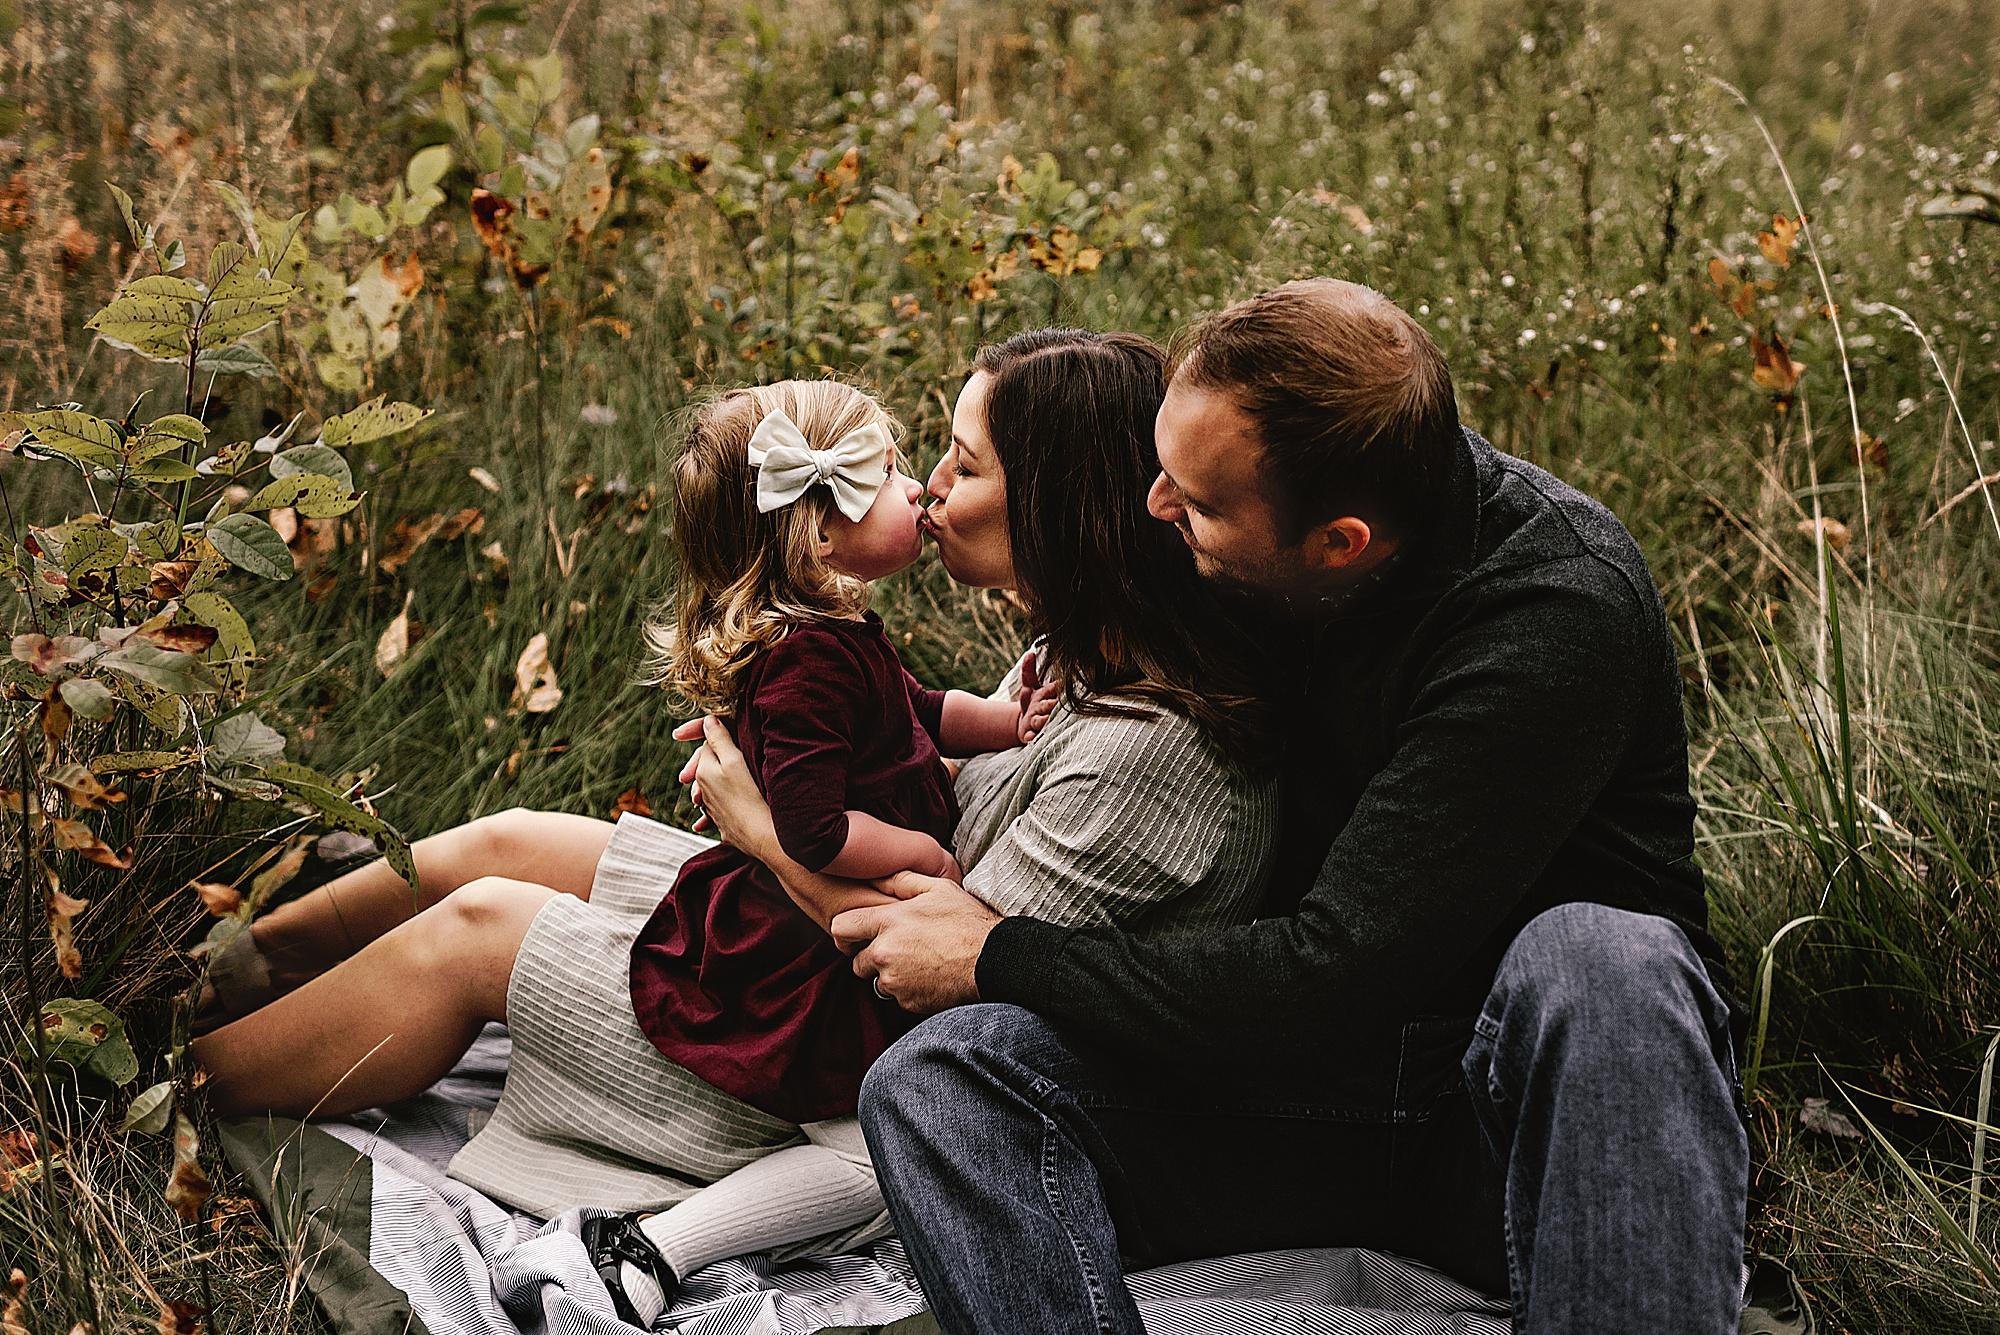 lauren-grayson-photography-akron-ohio-maternity-session-fall-hammer_0047.jpg